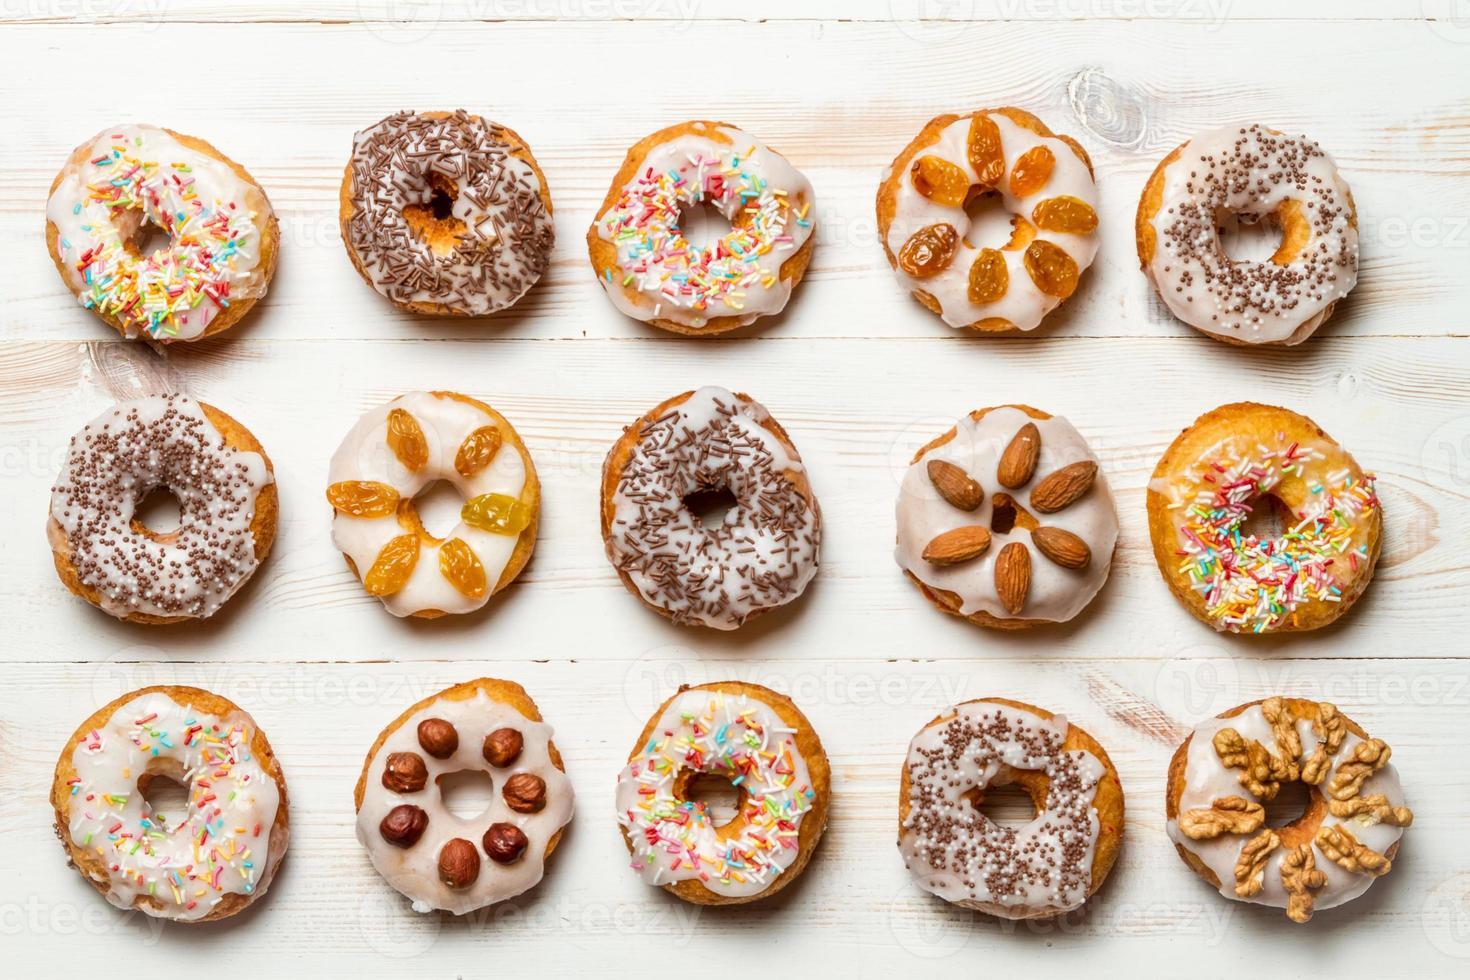 grupo de donuts coloridos decorados foto